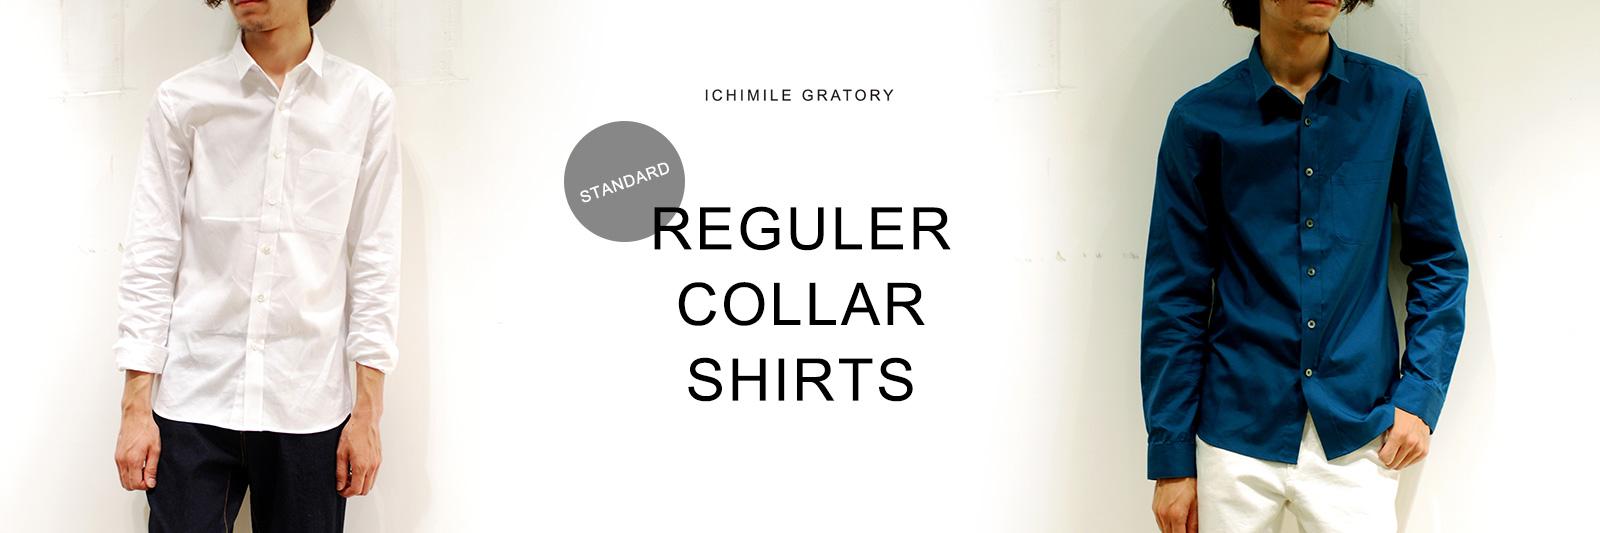 ICHIMILE GRATORY REGULER COLLAR SHIRTS